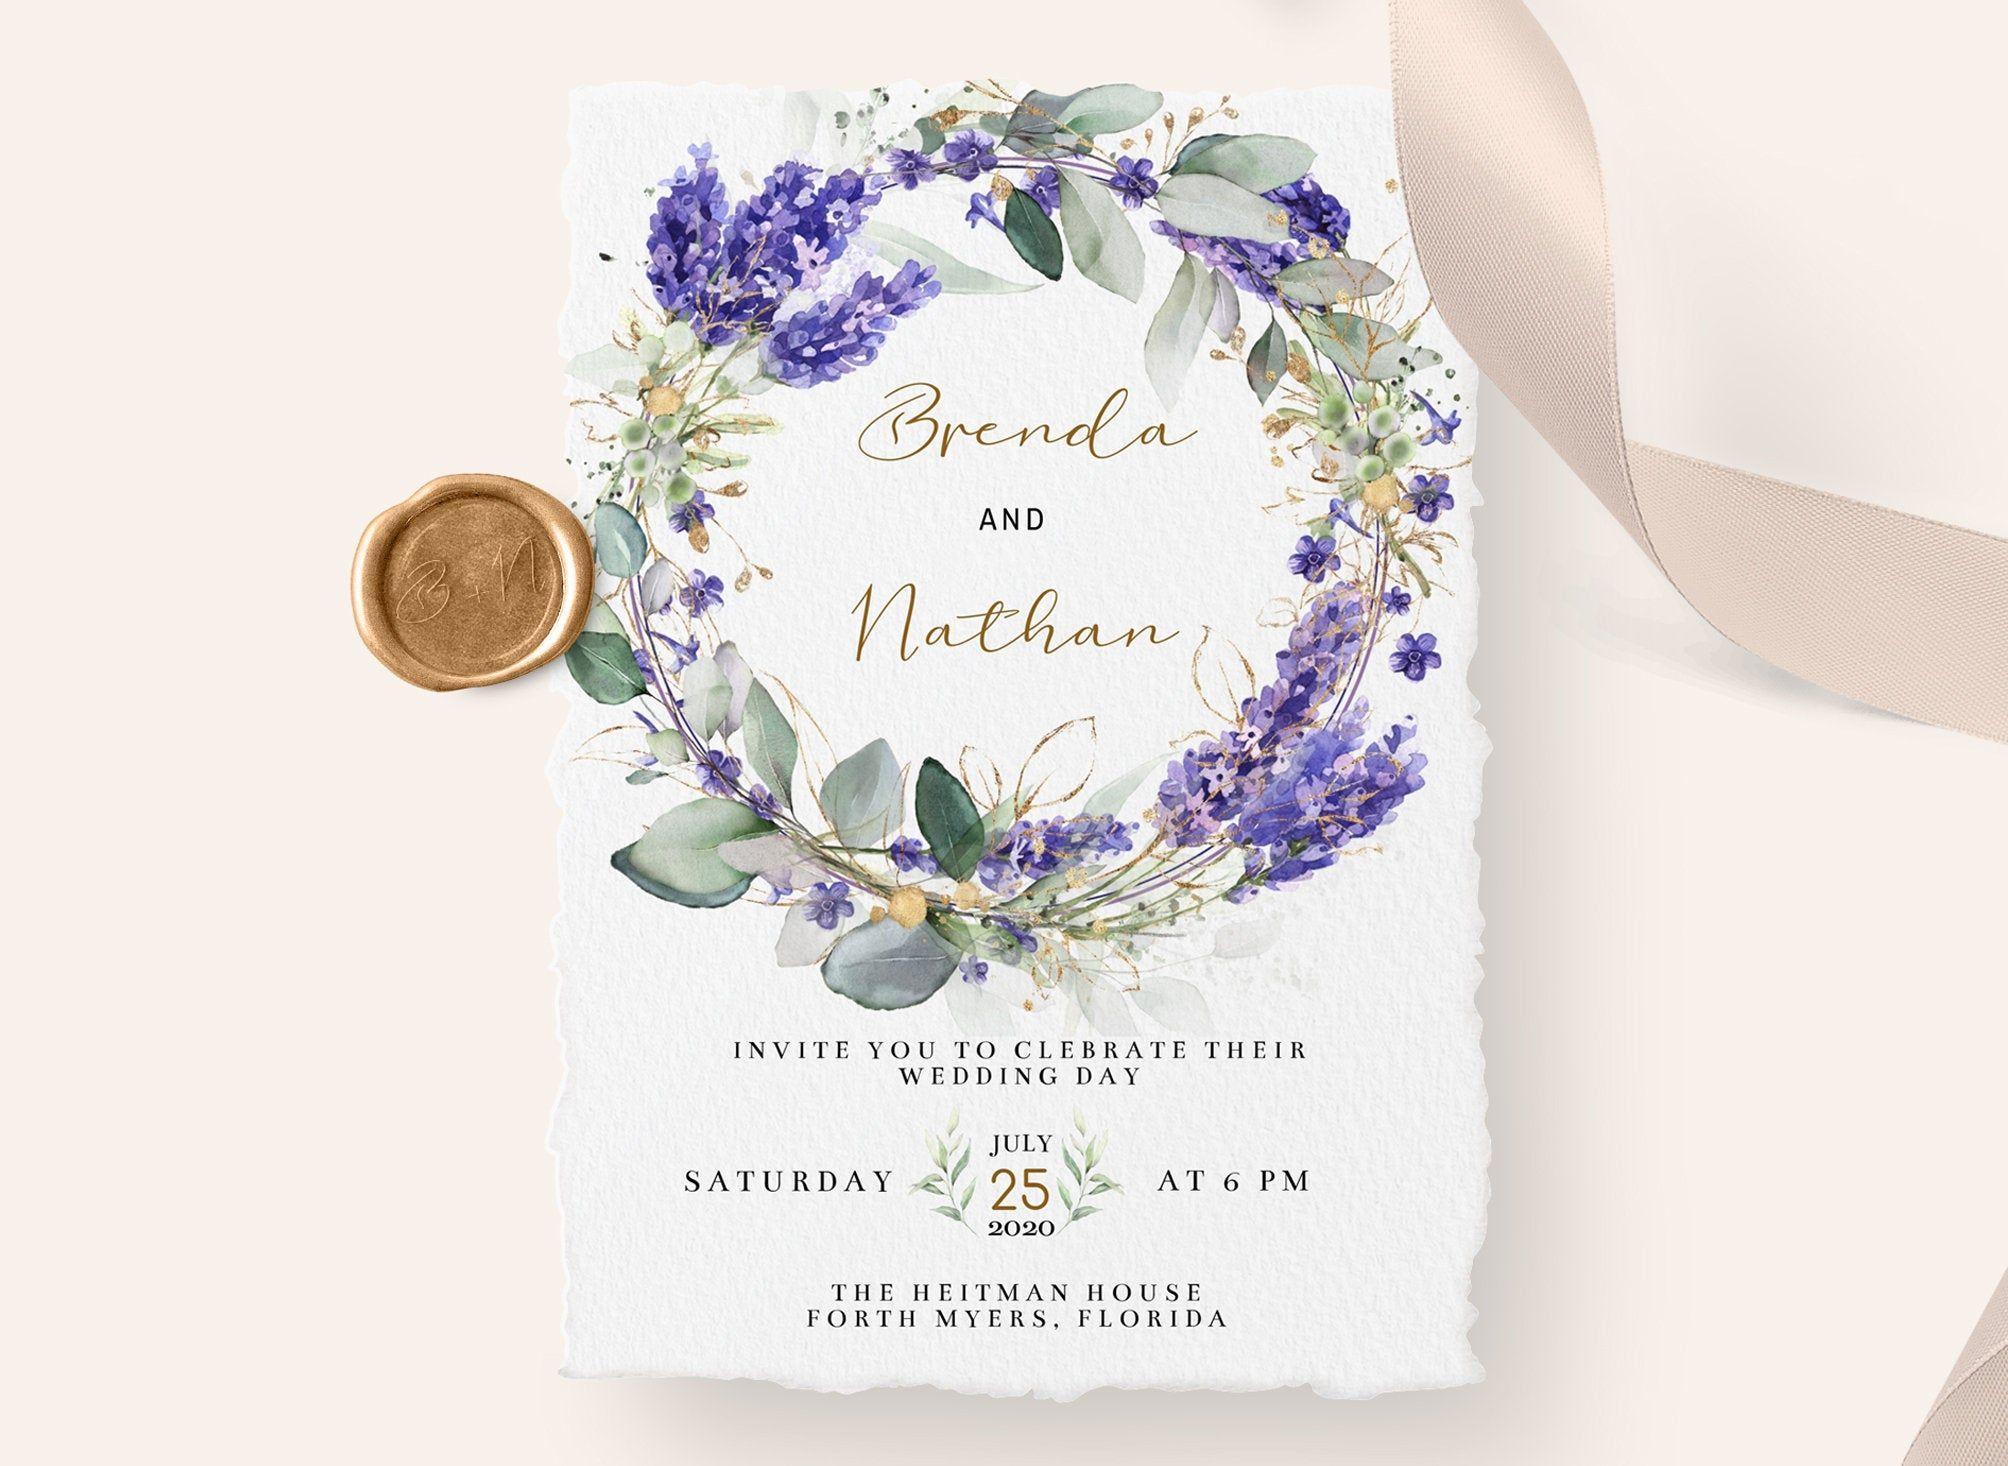 44+ Purple wedding invitations templates ideas in 2021